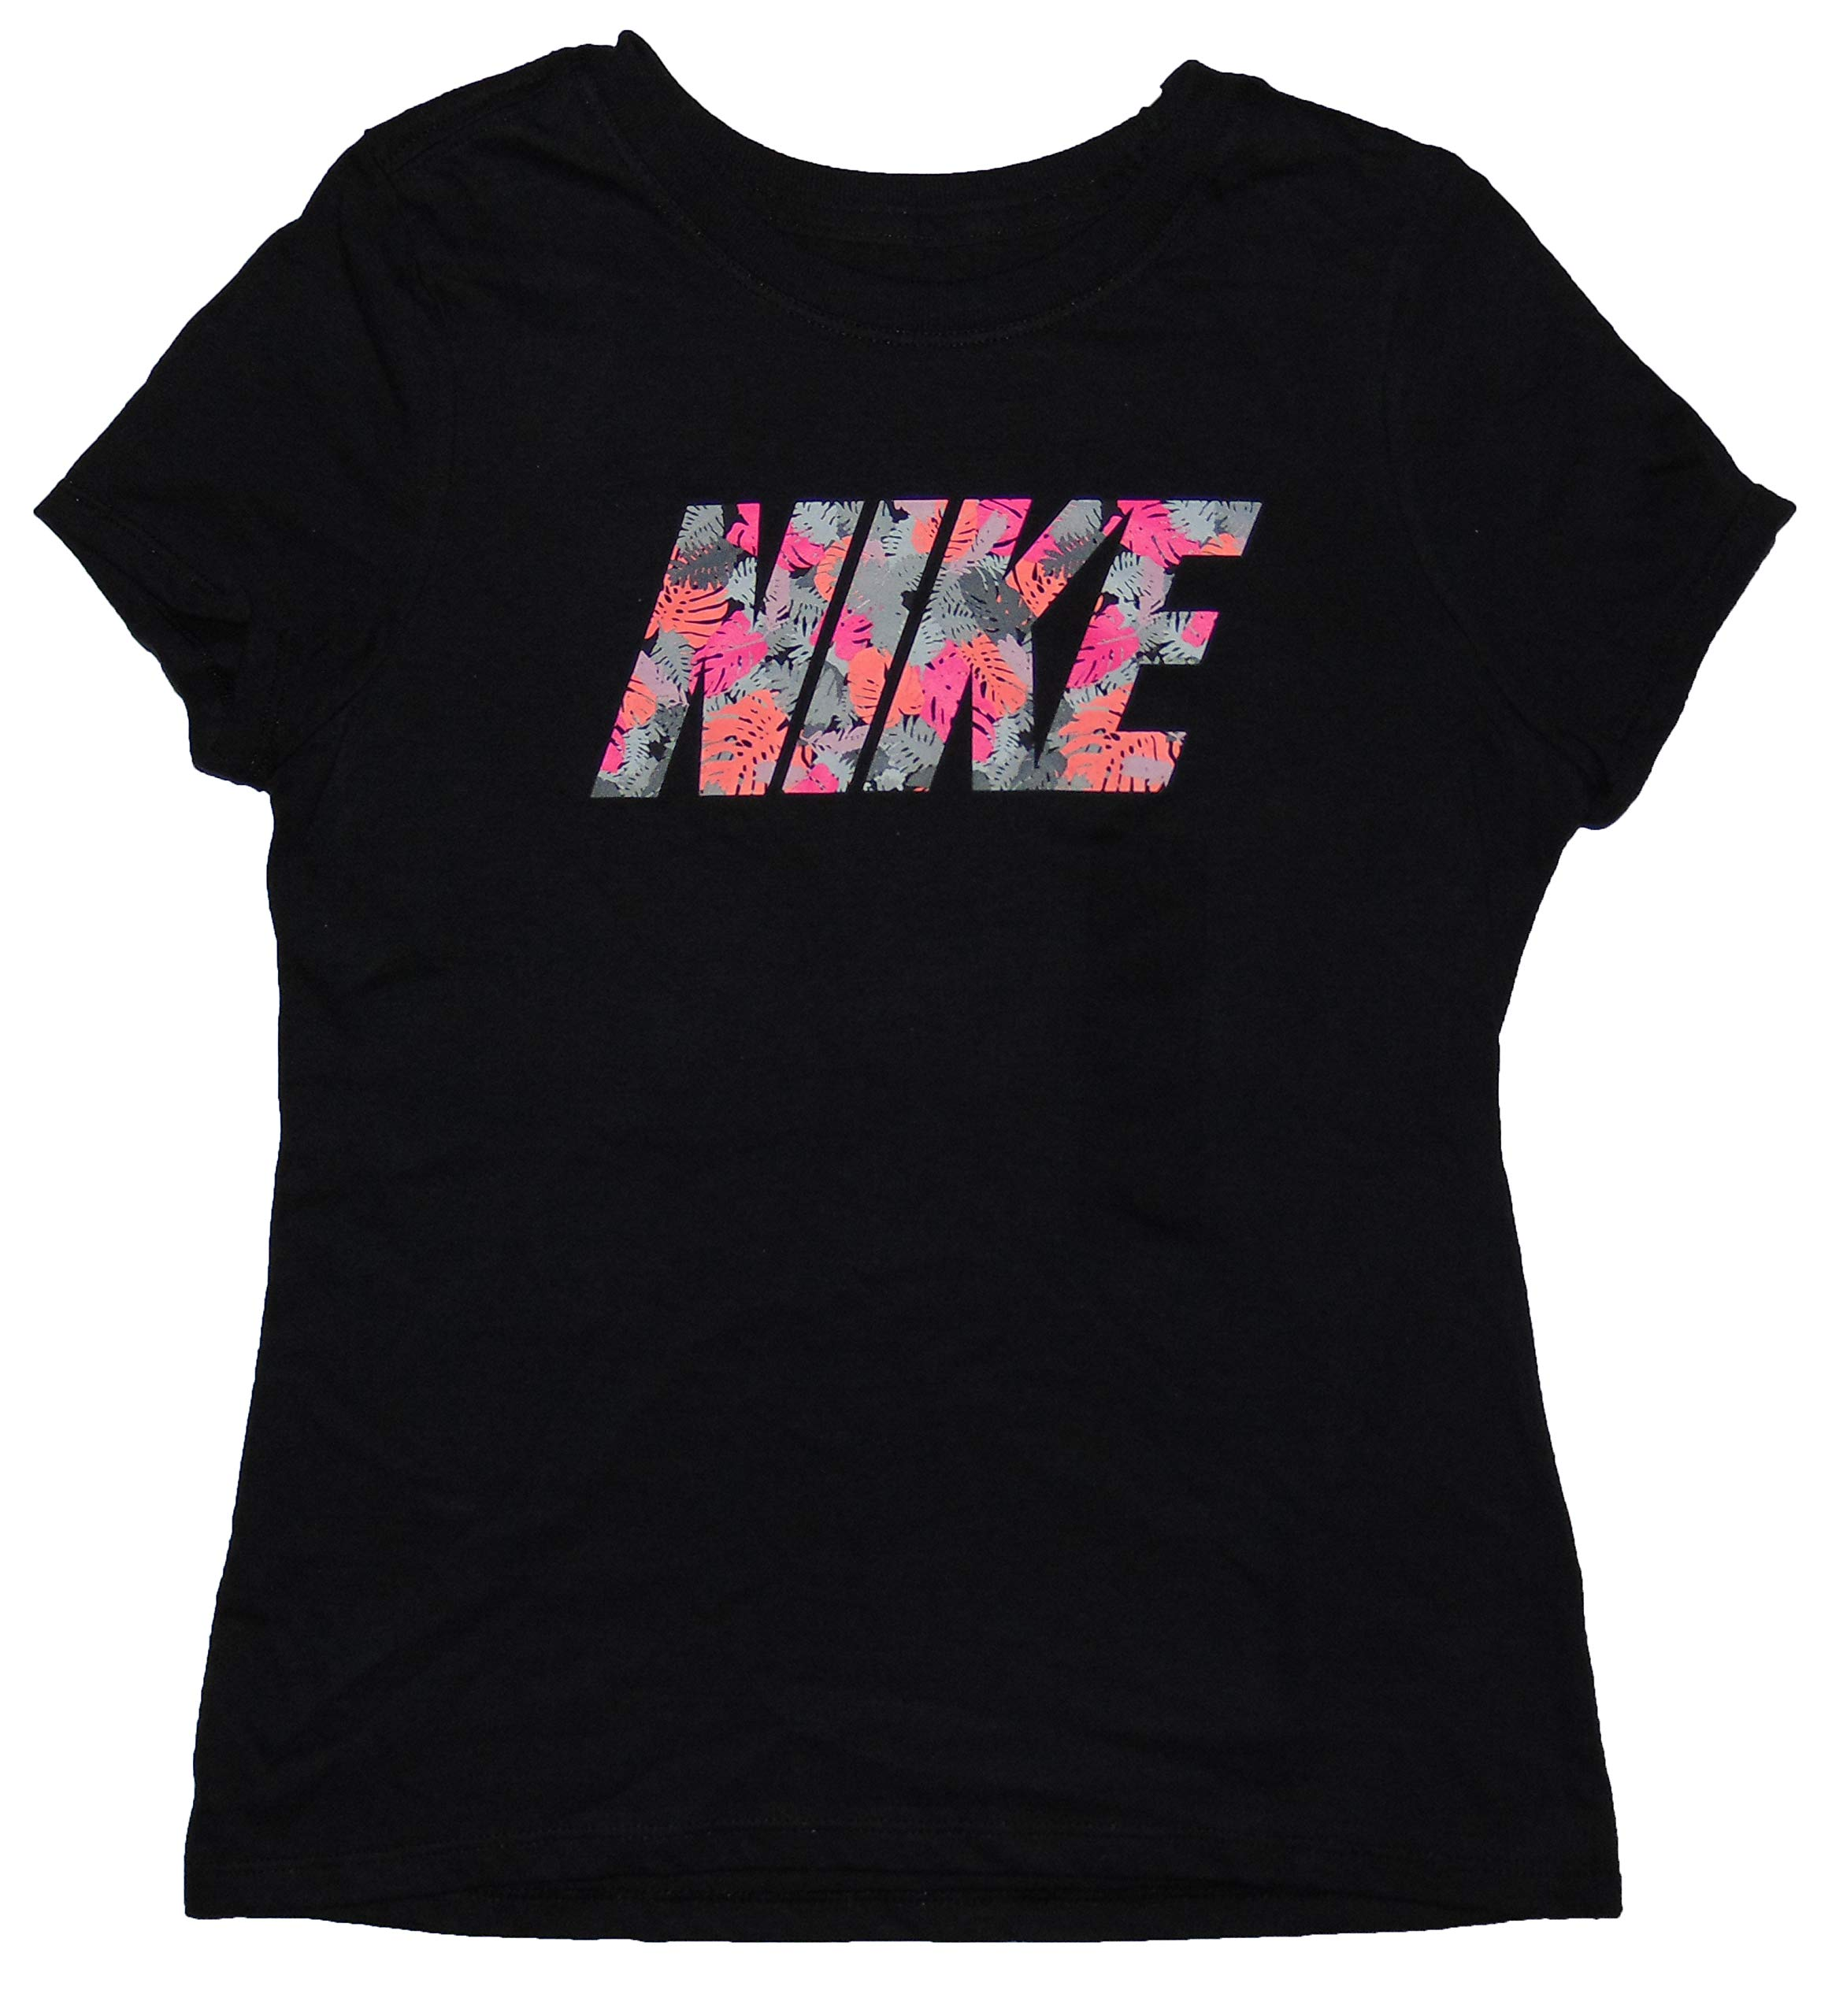 NIKE Girl's Graphic Tee Shirt Athletic Cut Medium Cotton Black by NIKE (Image #1)